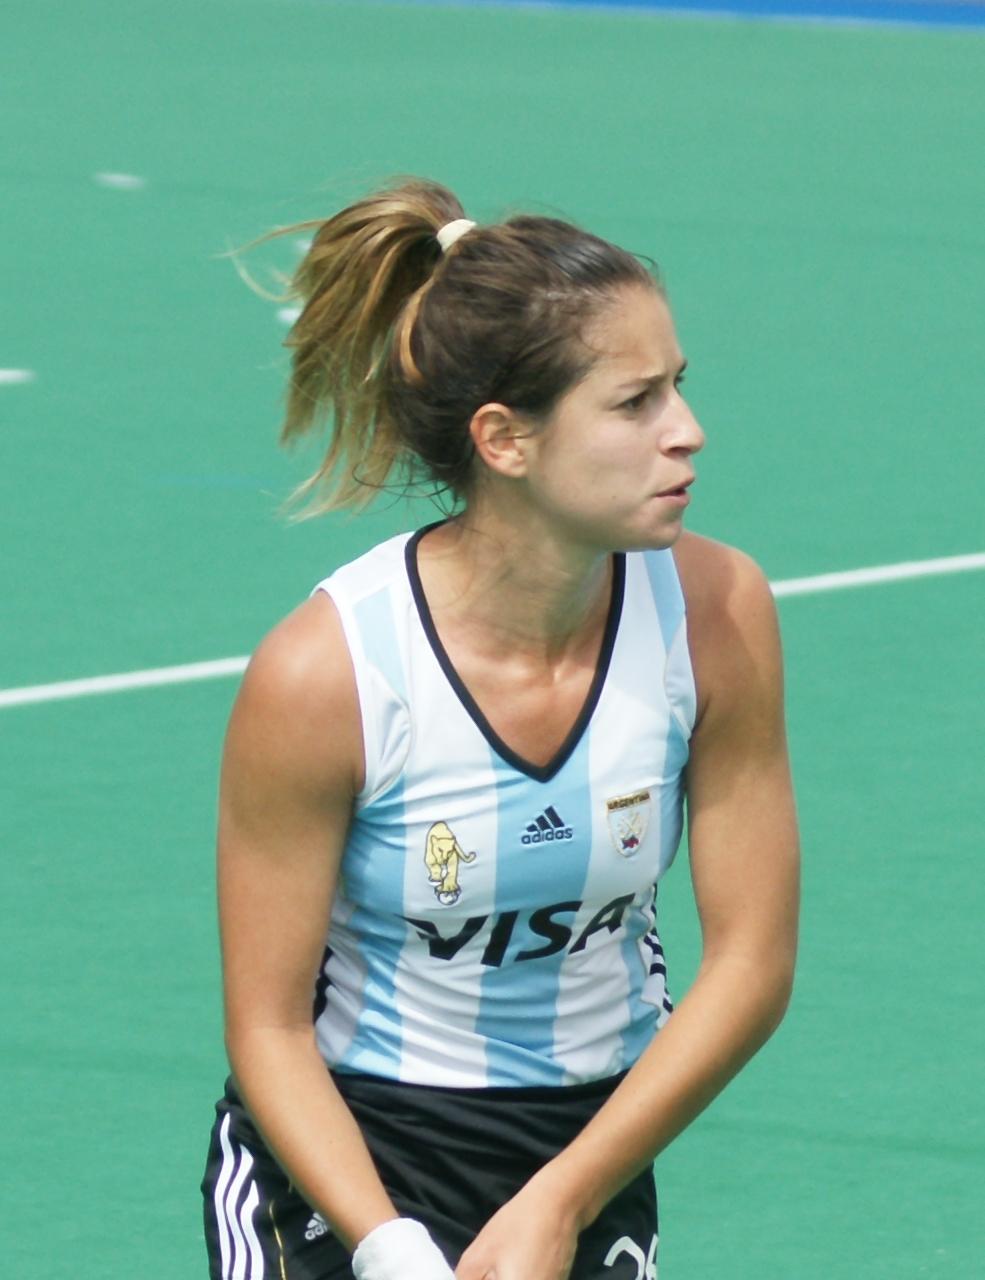 pics Giselle Kanevsky Olympic medal